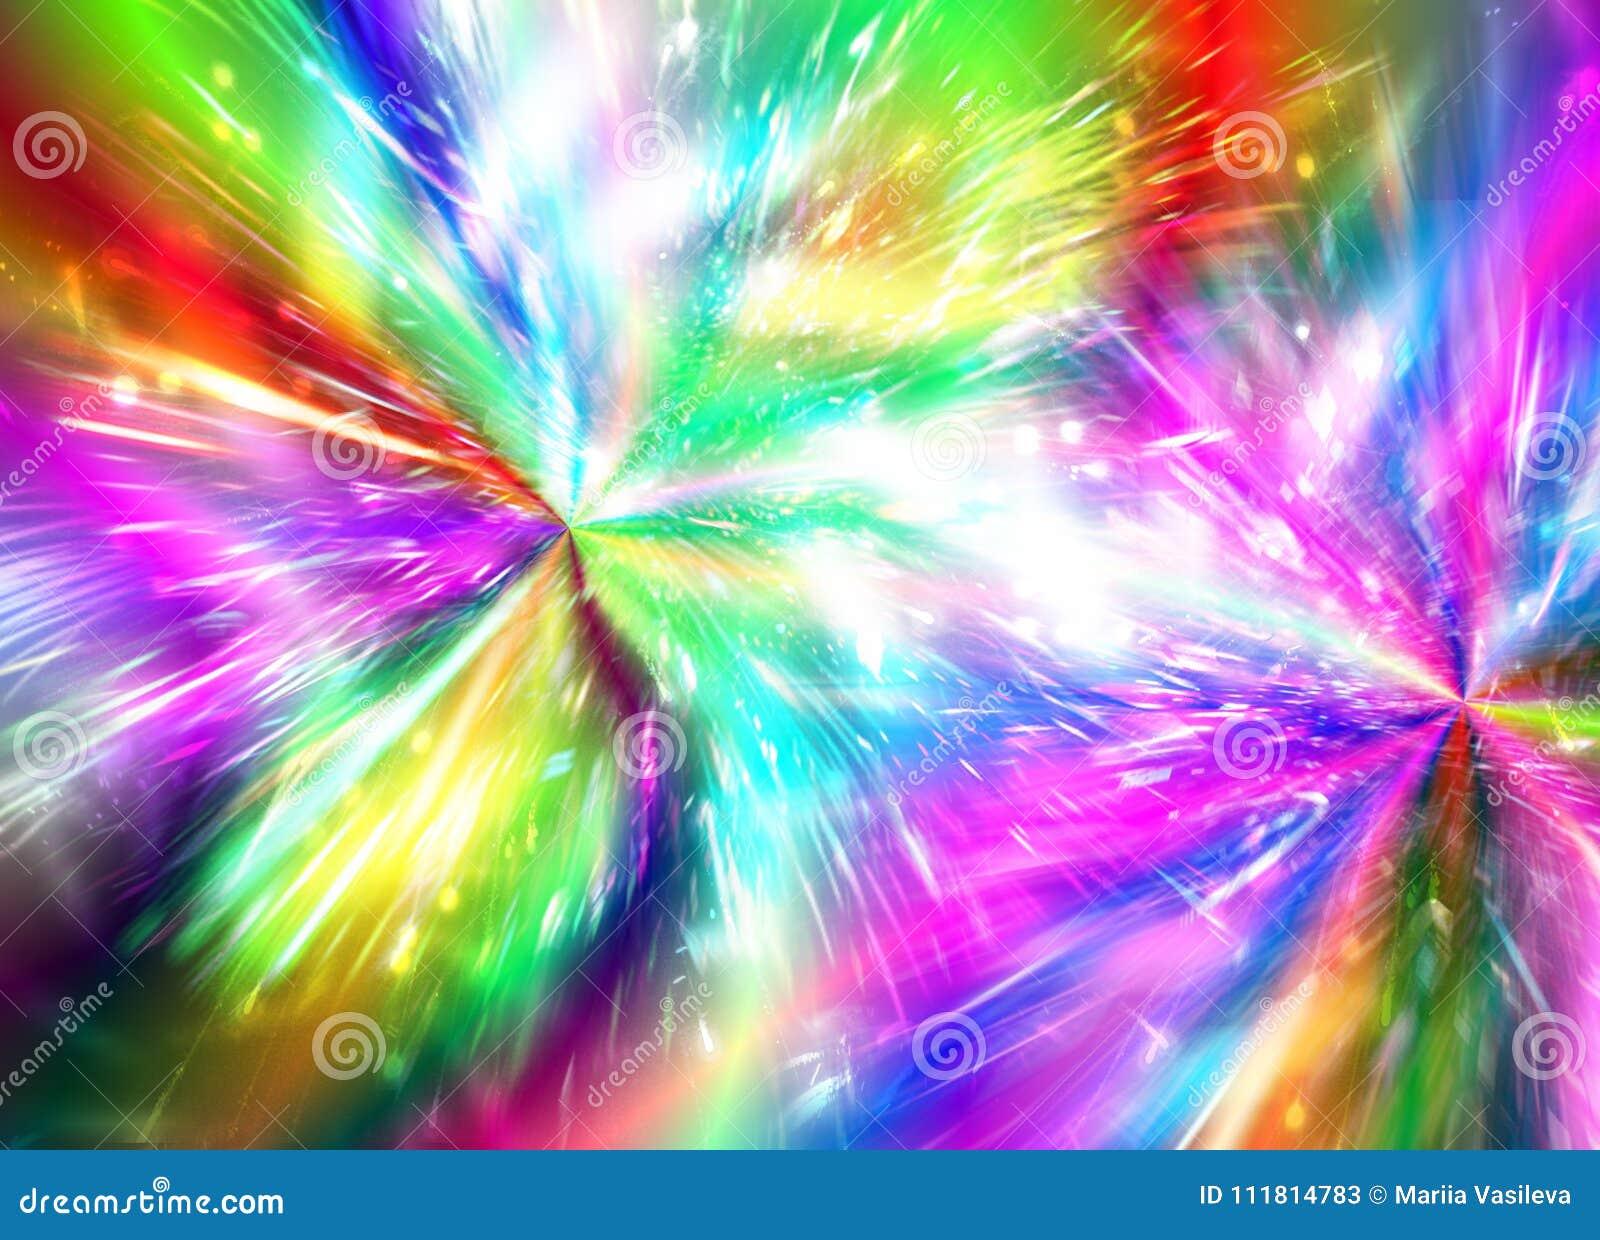 Rainbow Fireworks Celebration Colorful Abstract Image With: Abstract Rainbow Background Fireworks, Fireworks, Holiday